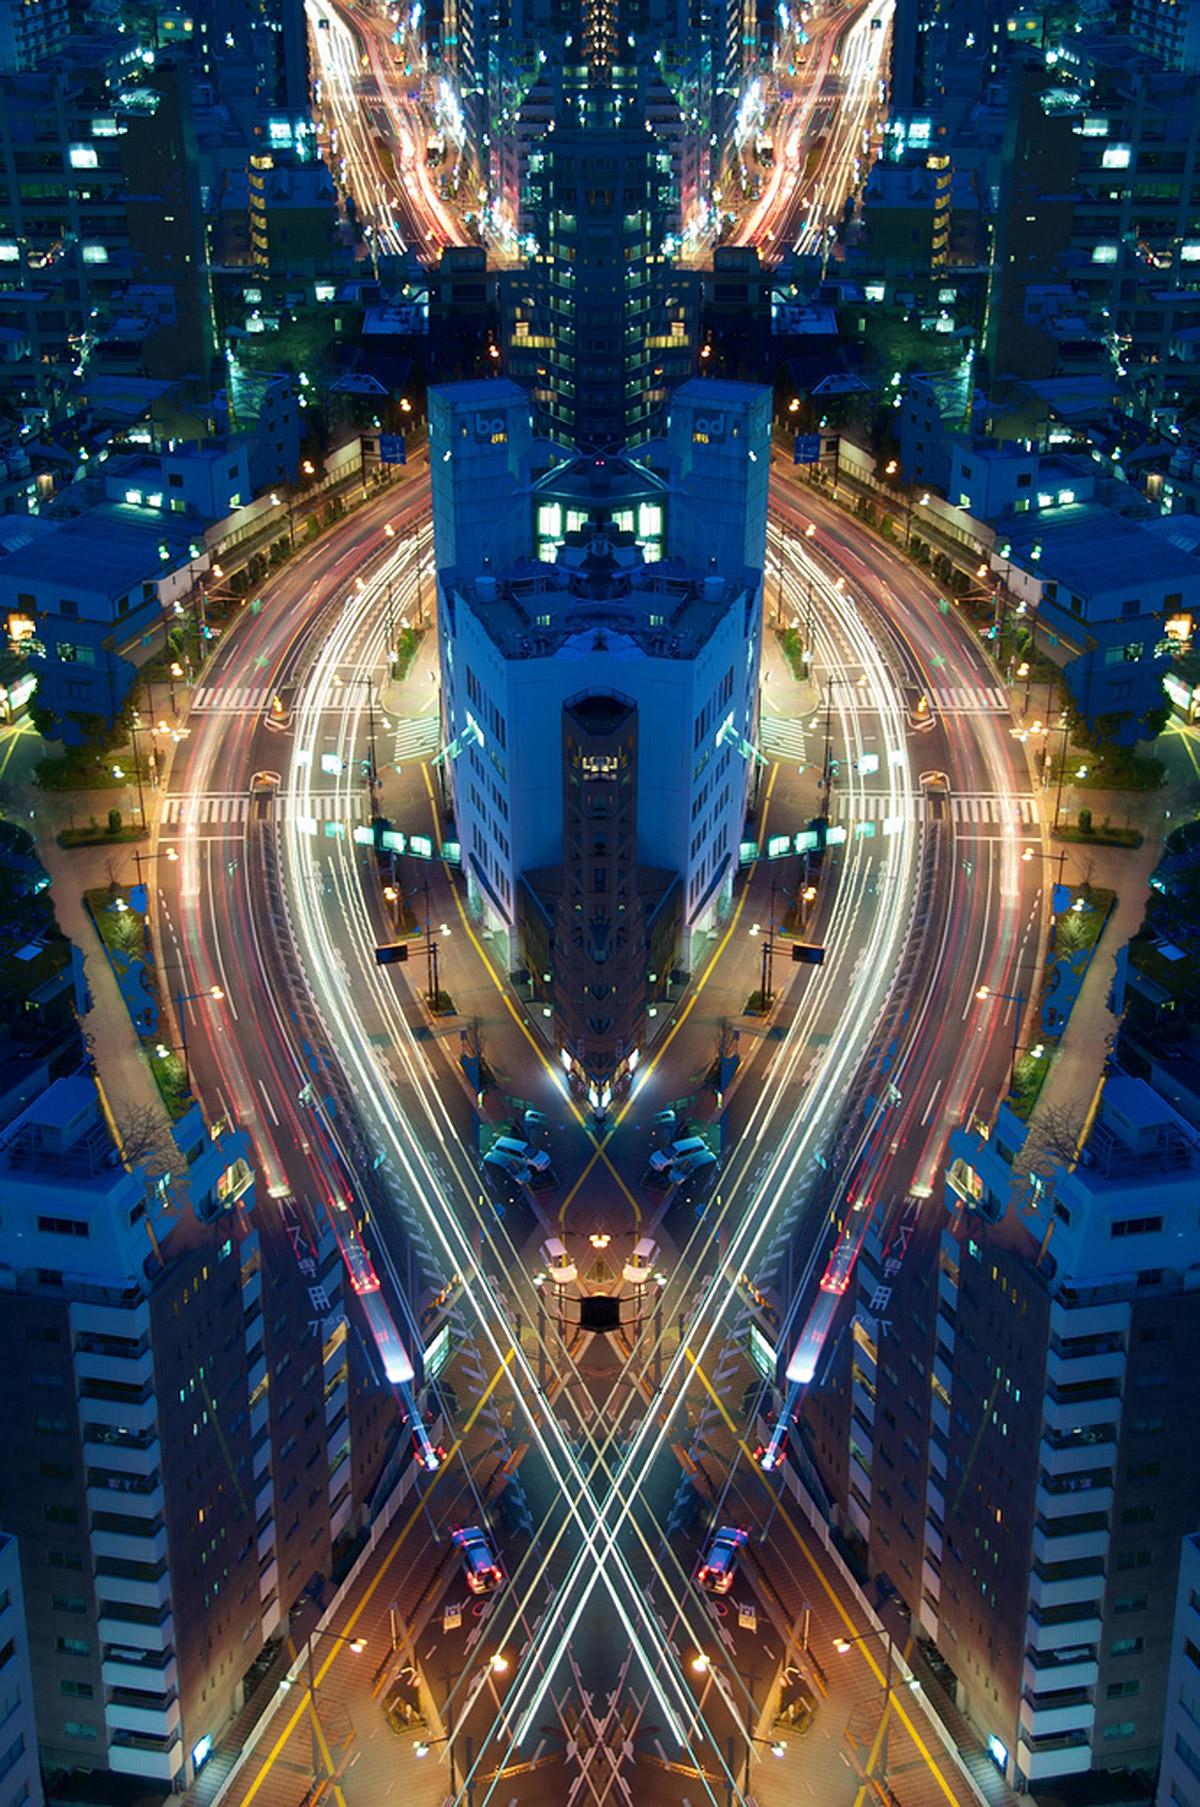 shinichi-higashi-tokyo-symmetry-19